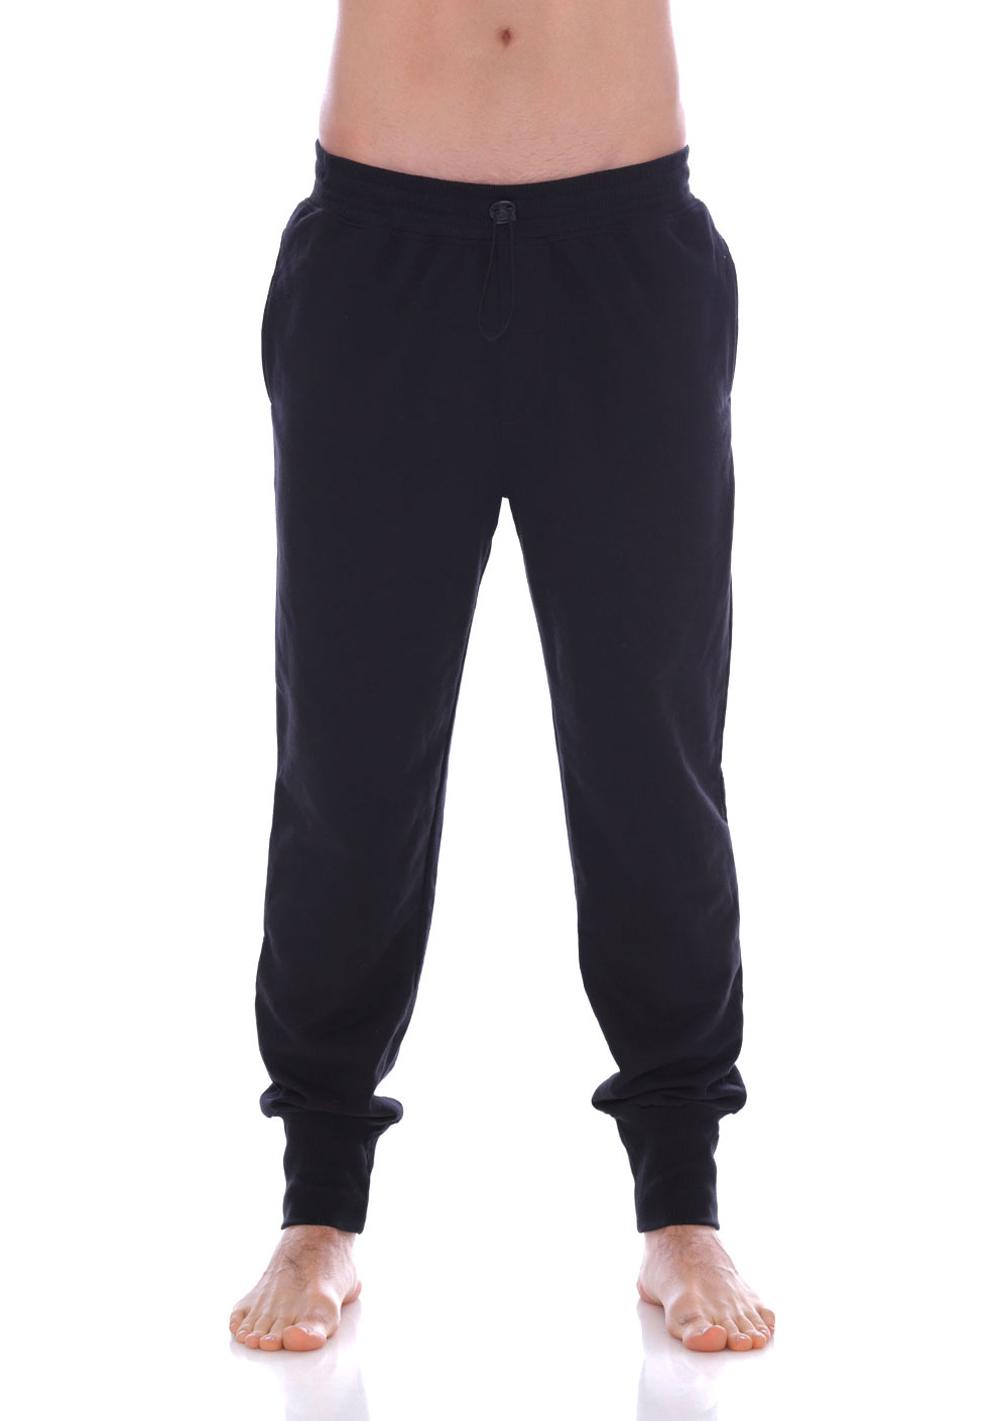 Mundo Unico Comfort Wear Long Jogger | Black